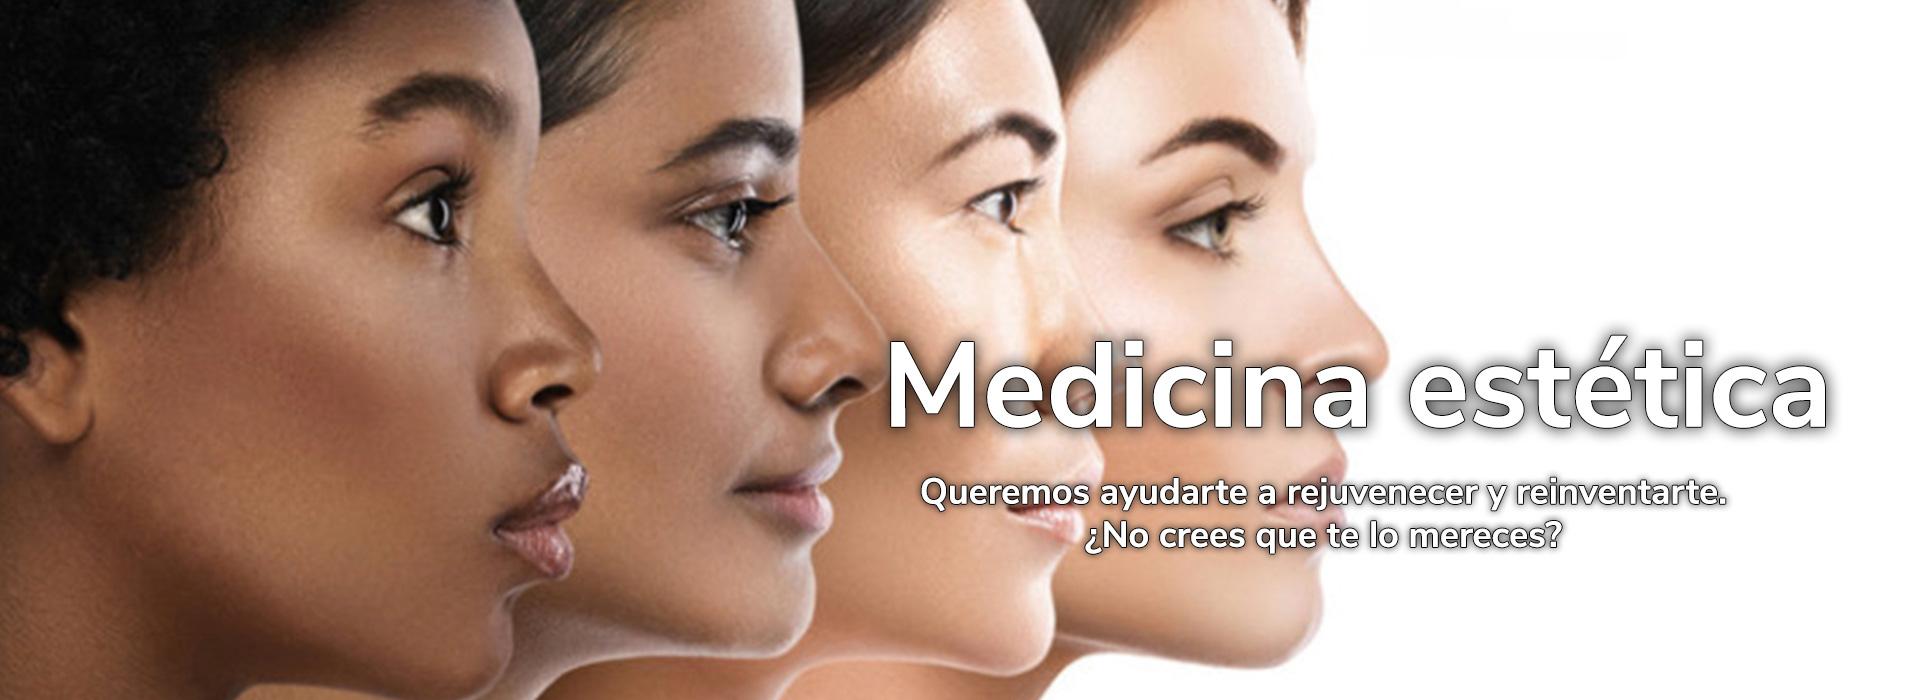 banner_medicina-estetica